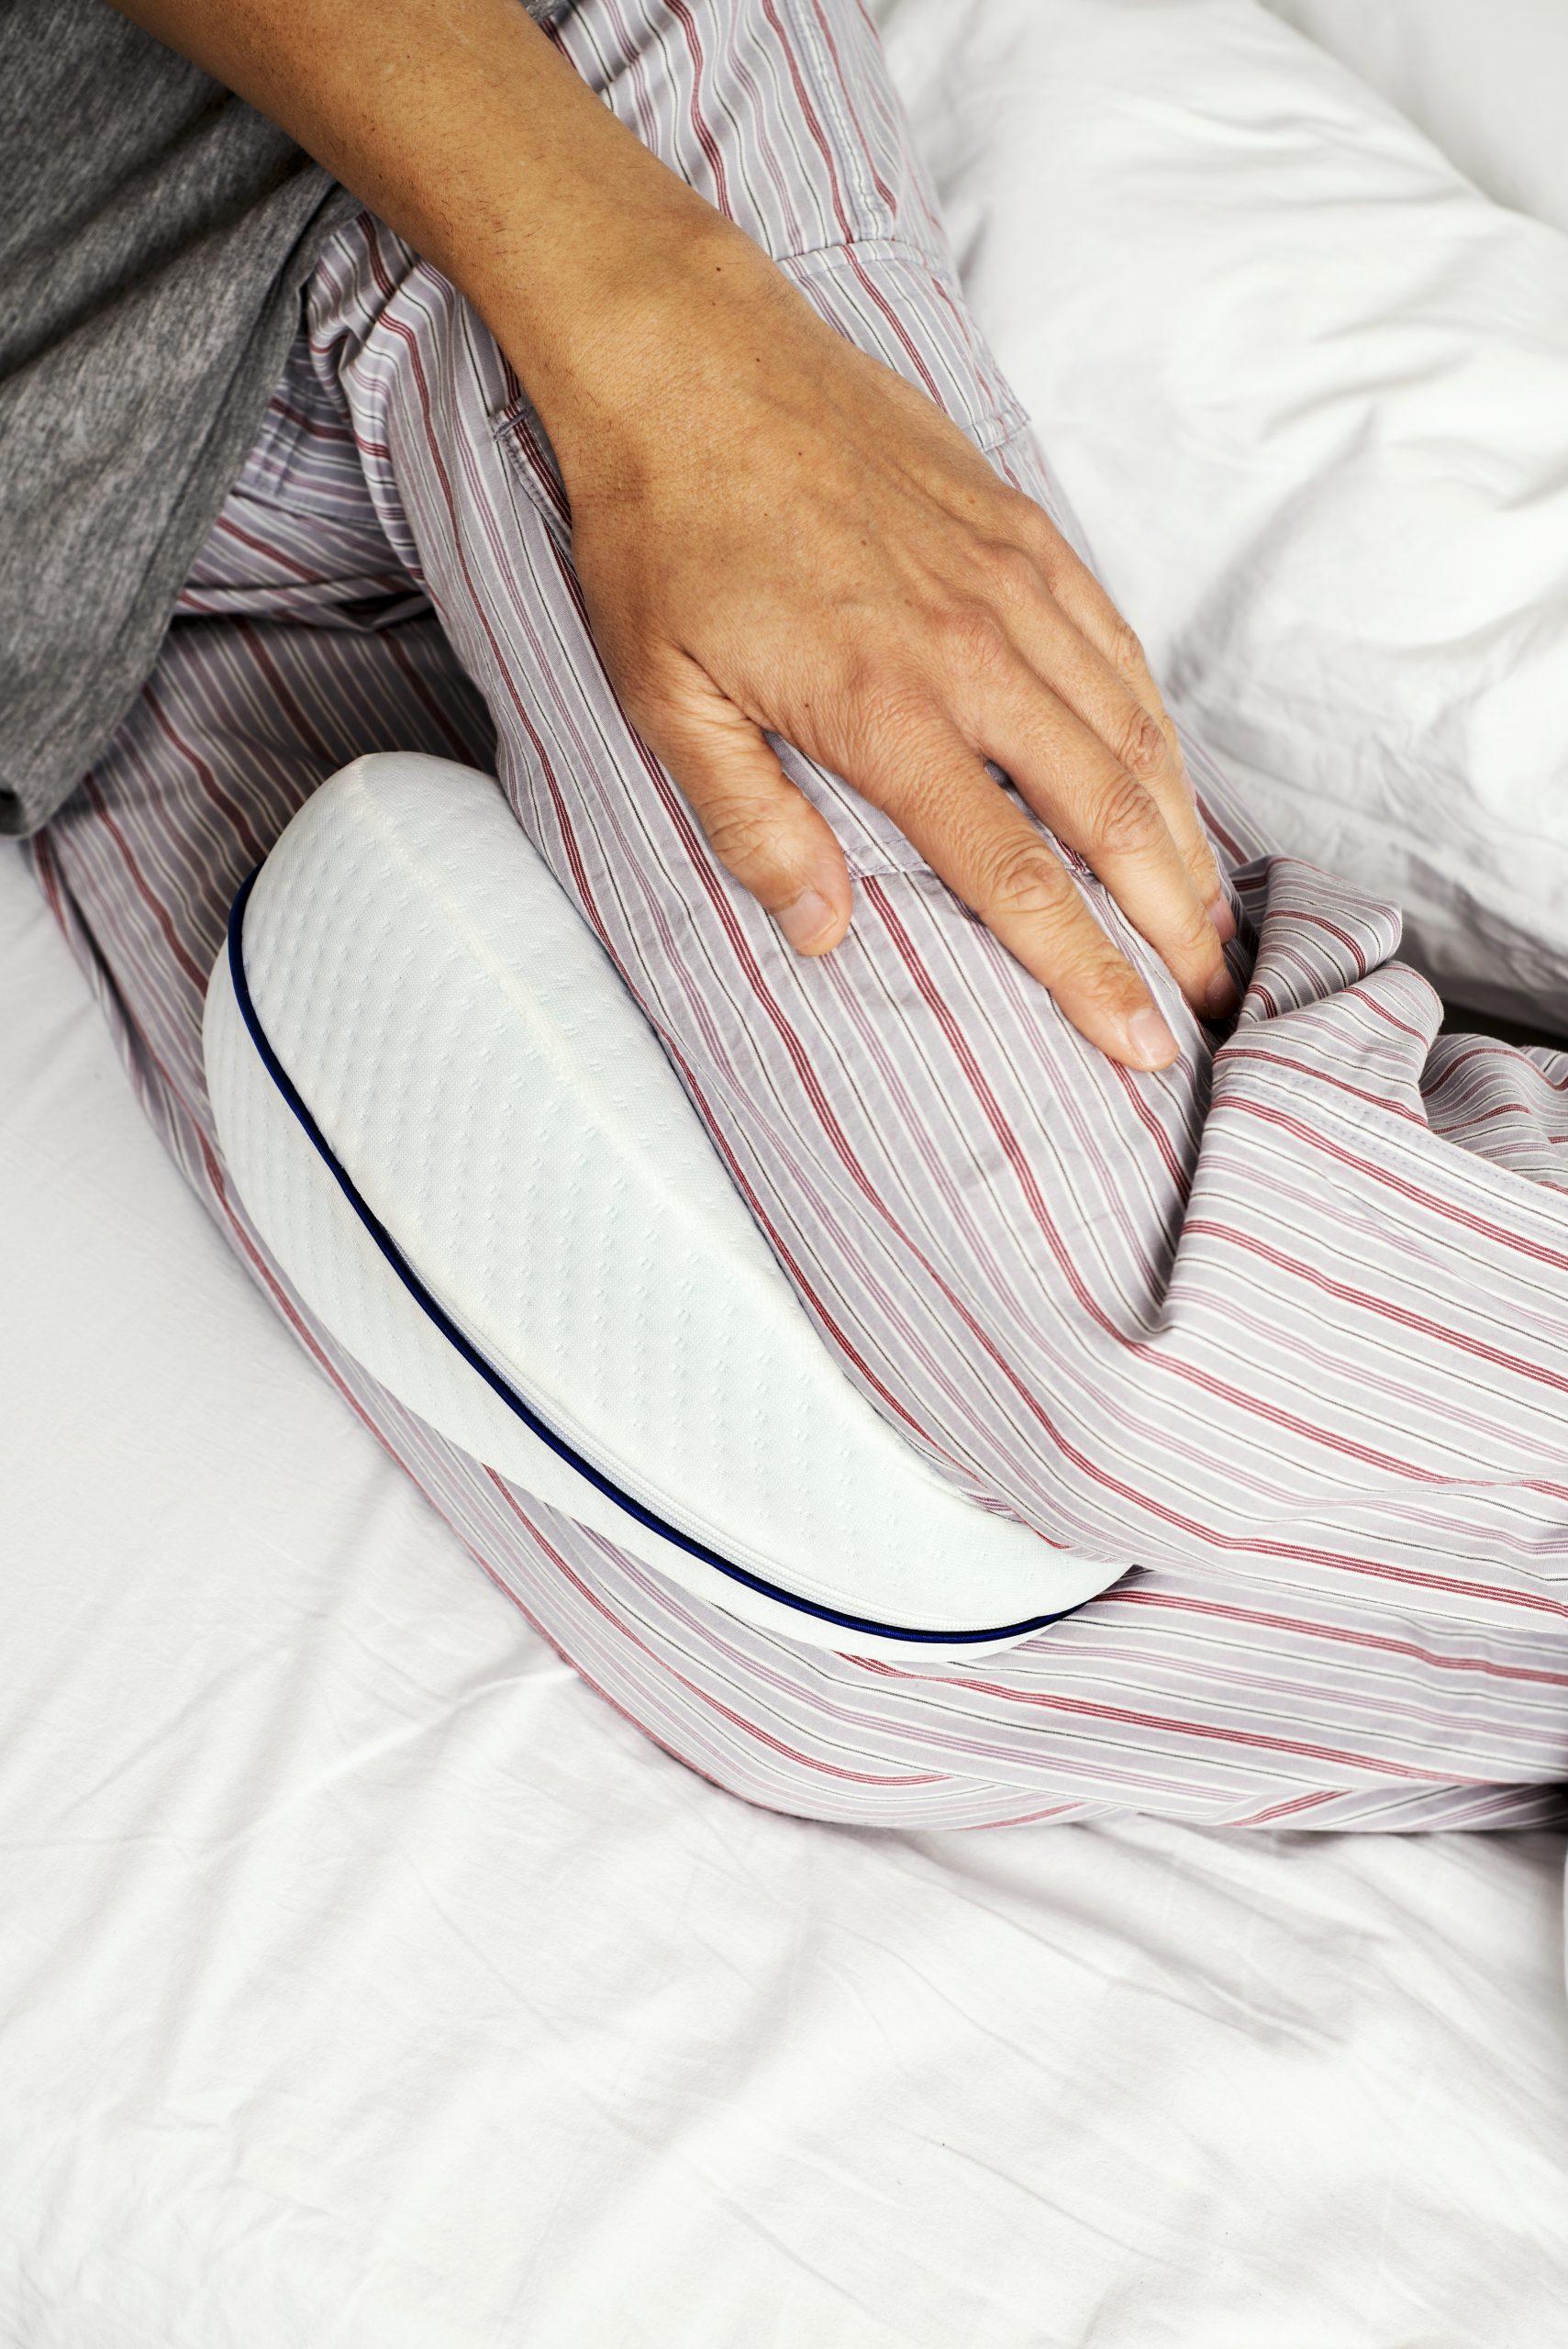 Comment choisir son oreiller postural ?